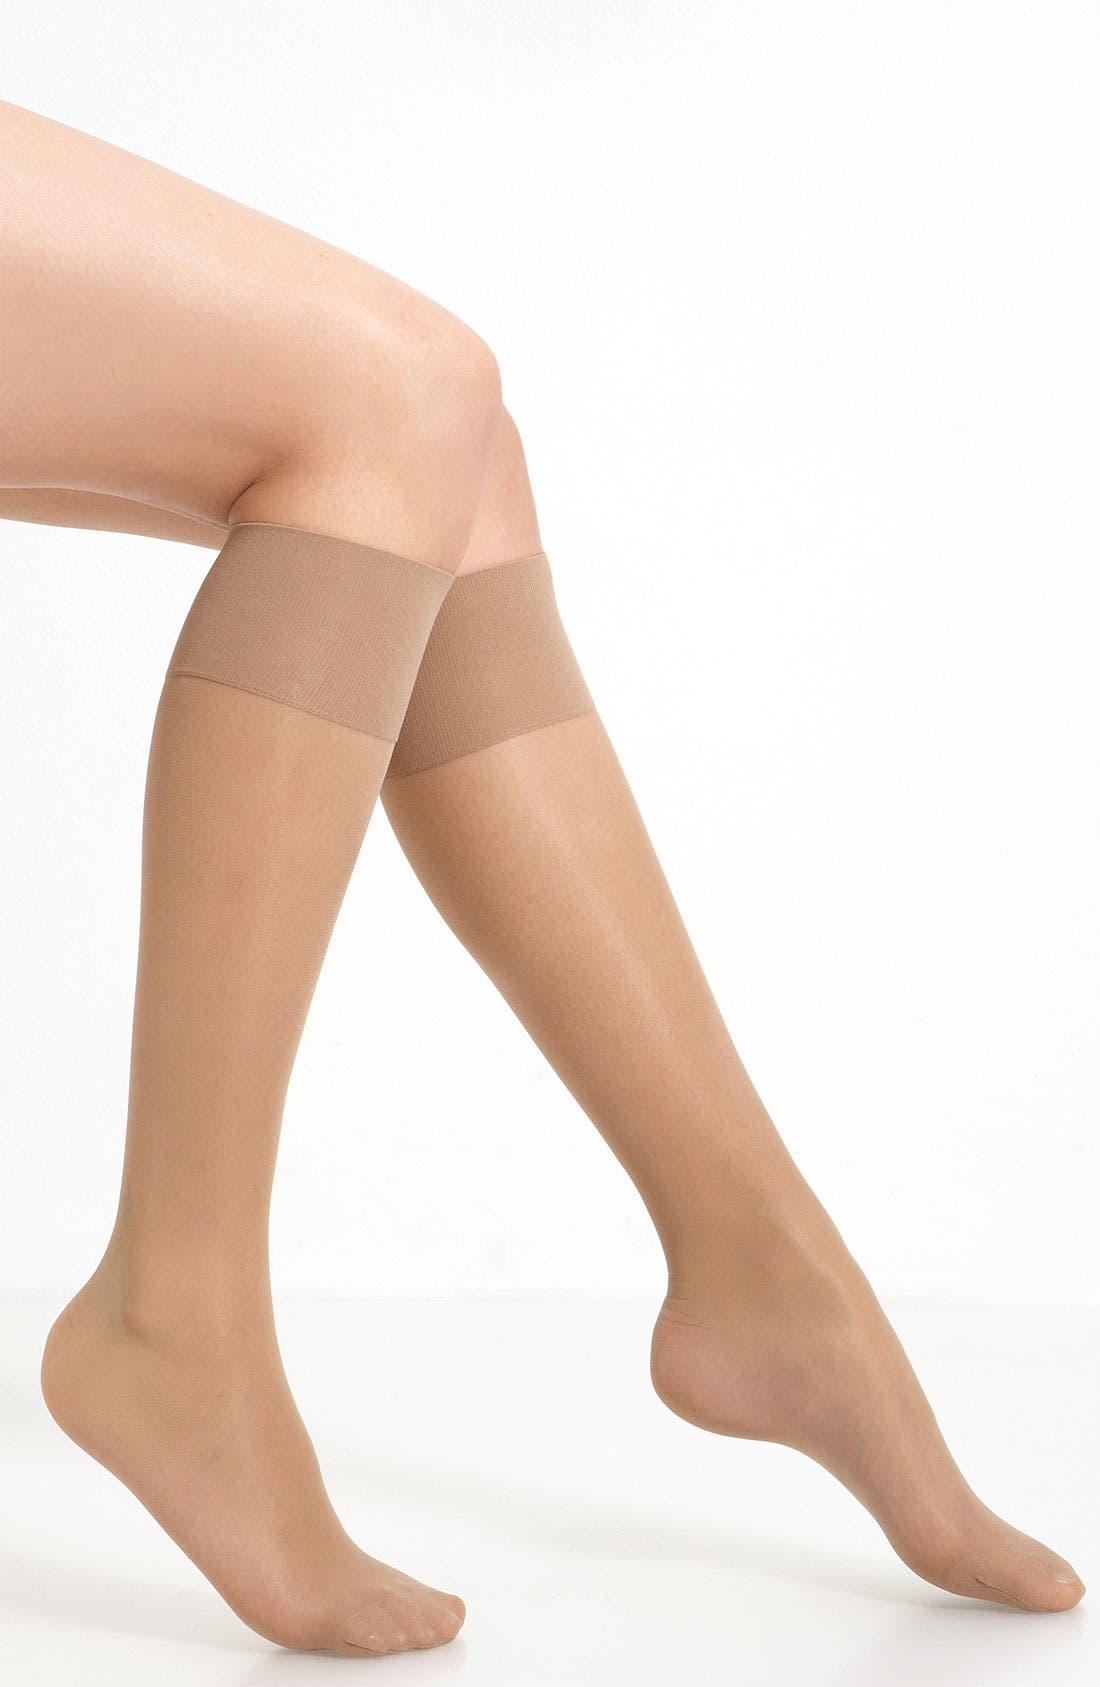 OROBLU 'Mi-Bas Repos 70' Sheer Support Knee Highs, Main, color, NUDE